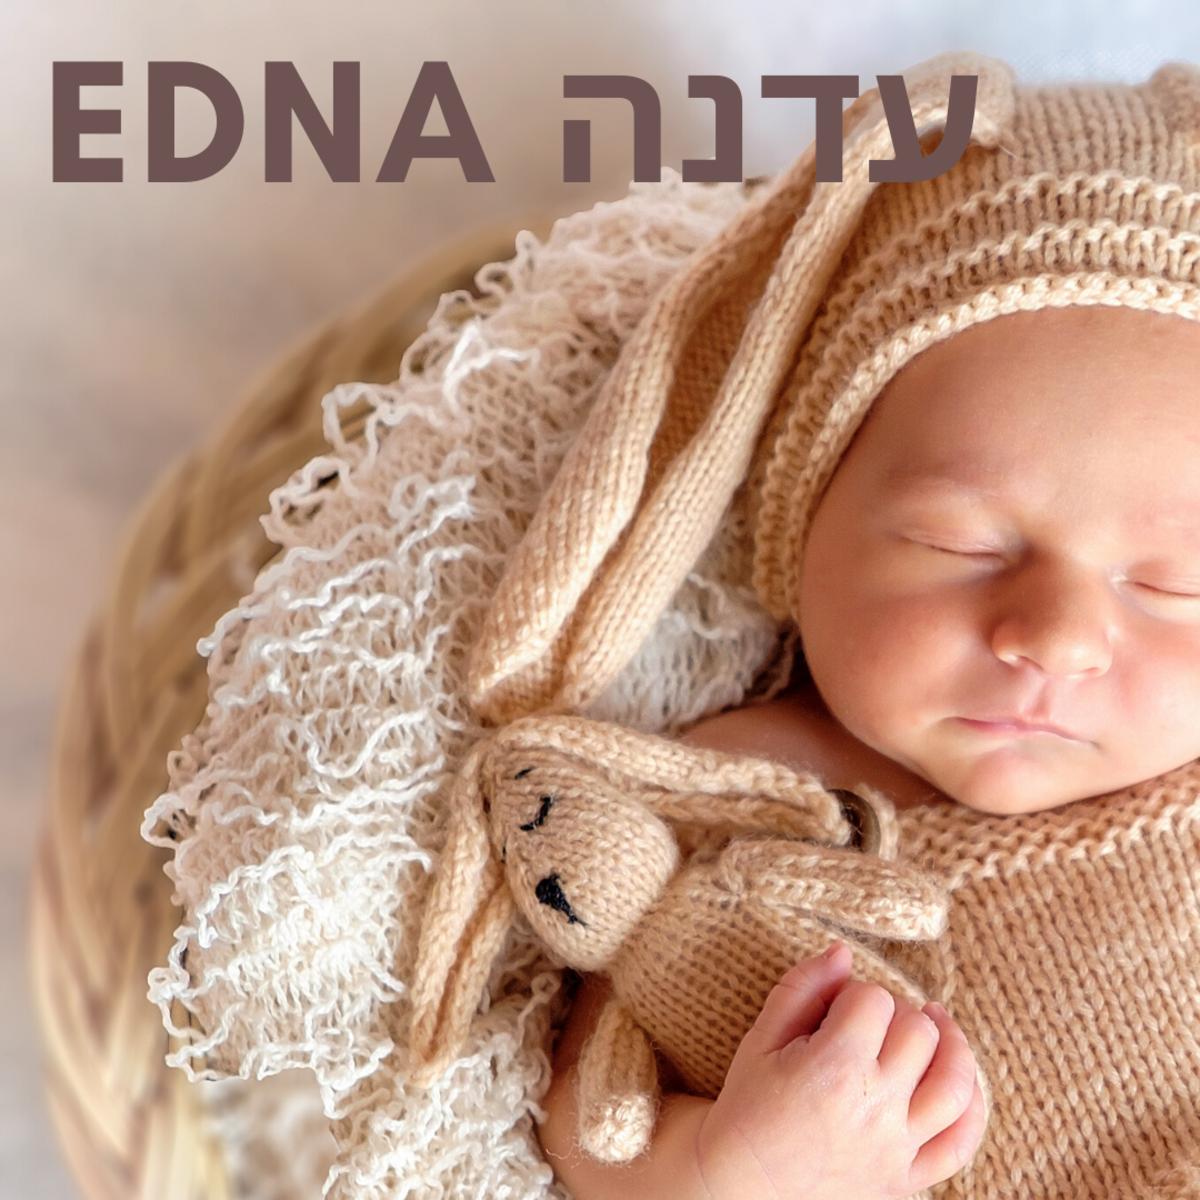 Baby Edna